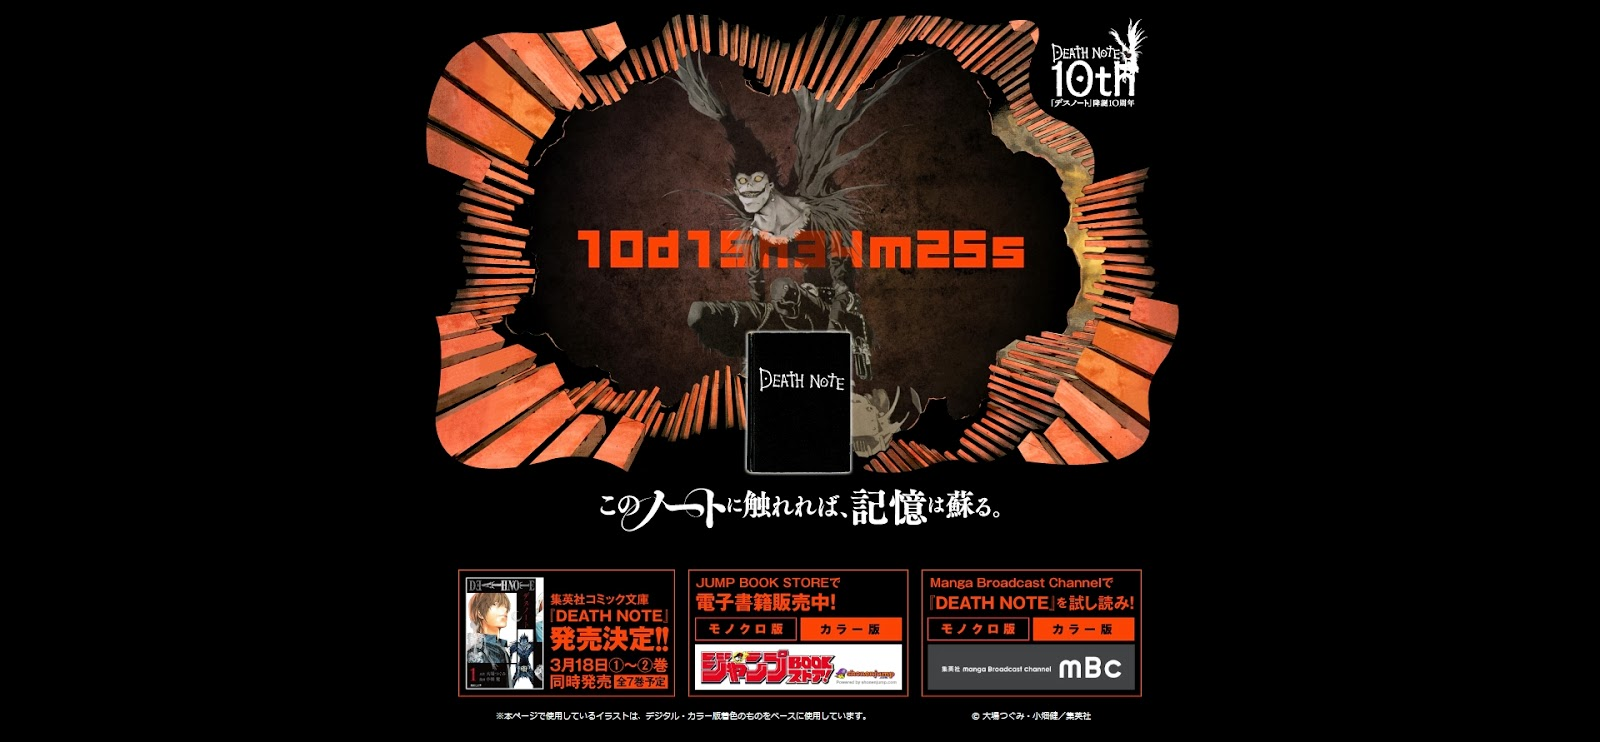 Death Note, Actu Manga, Manga, Tsugumi Oba, Takeshi Obata, 10th Anniversary,